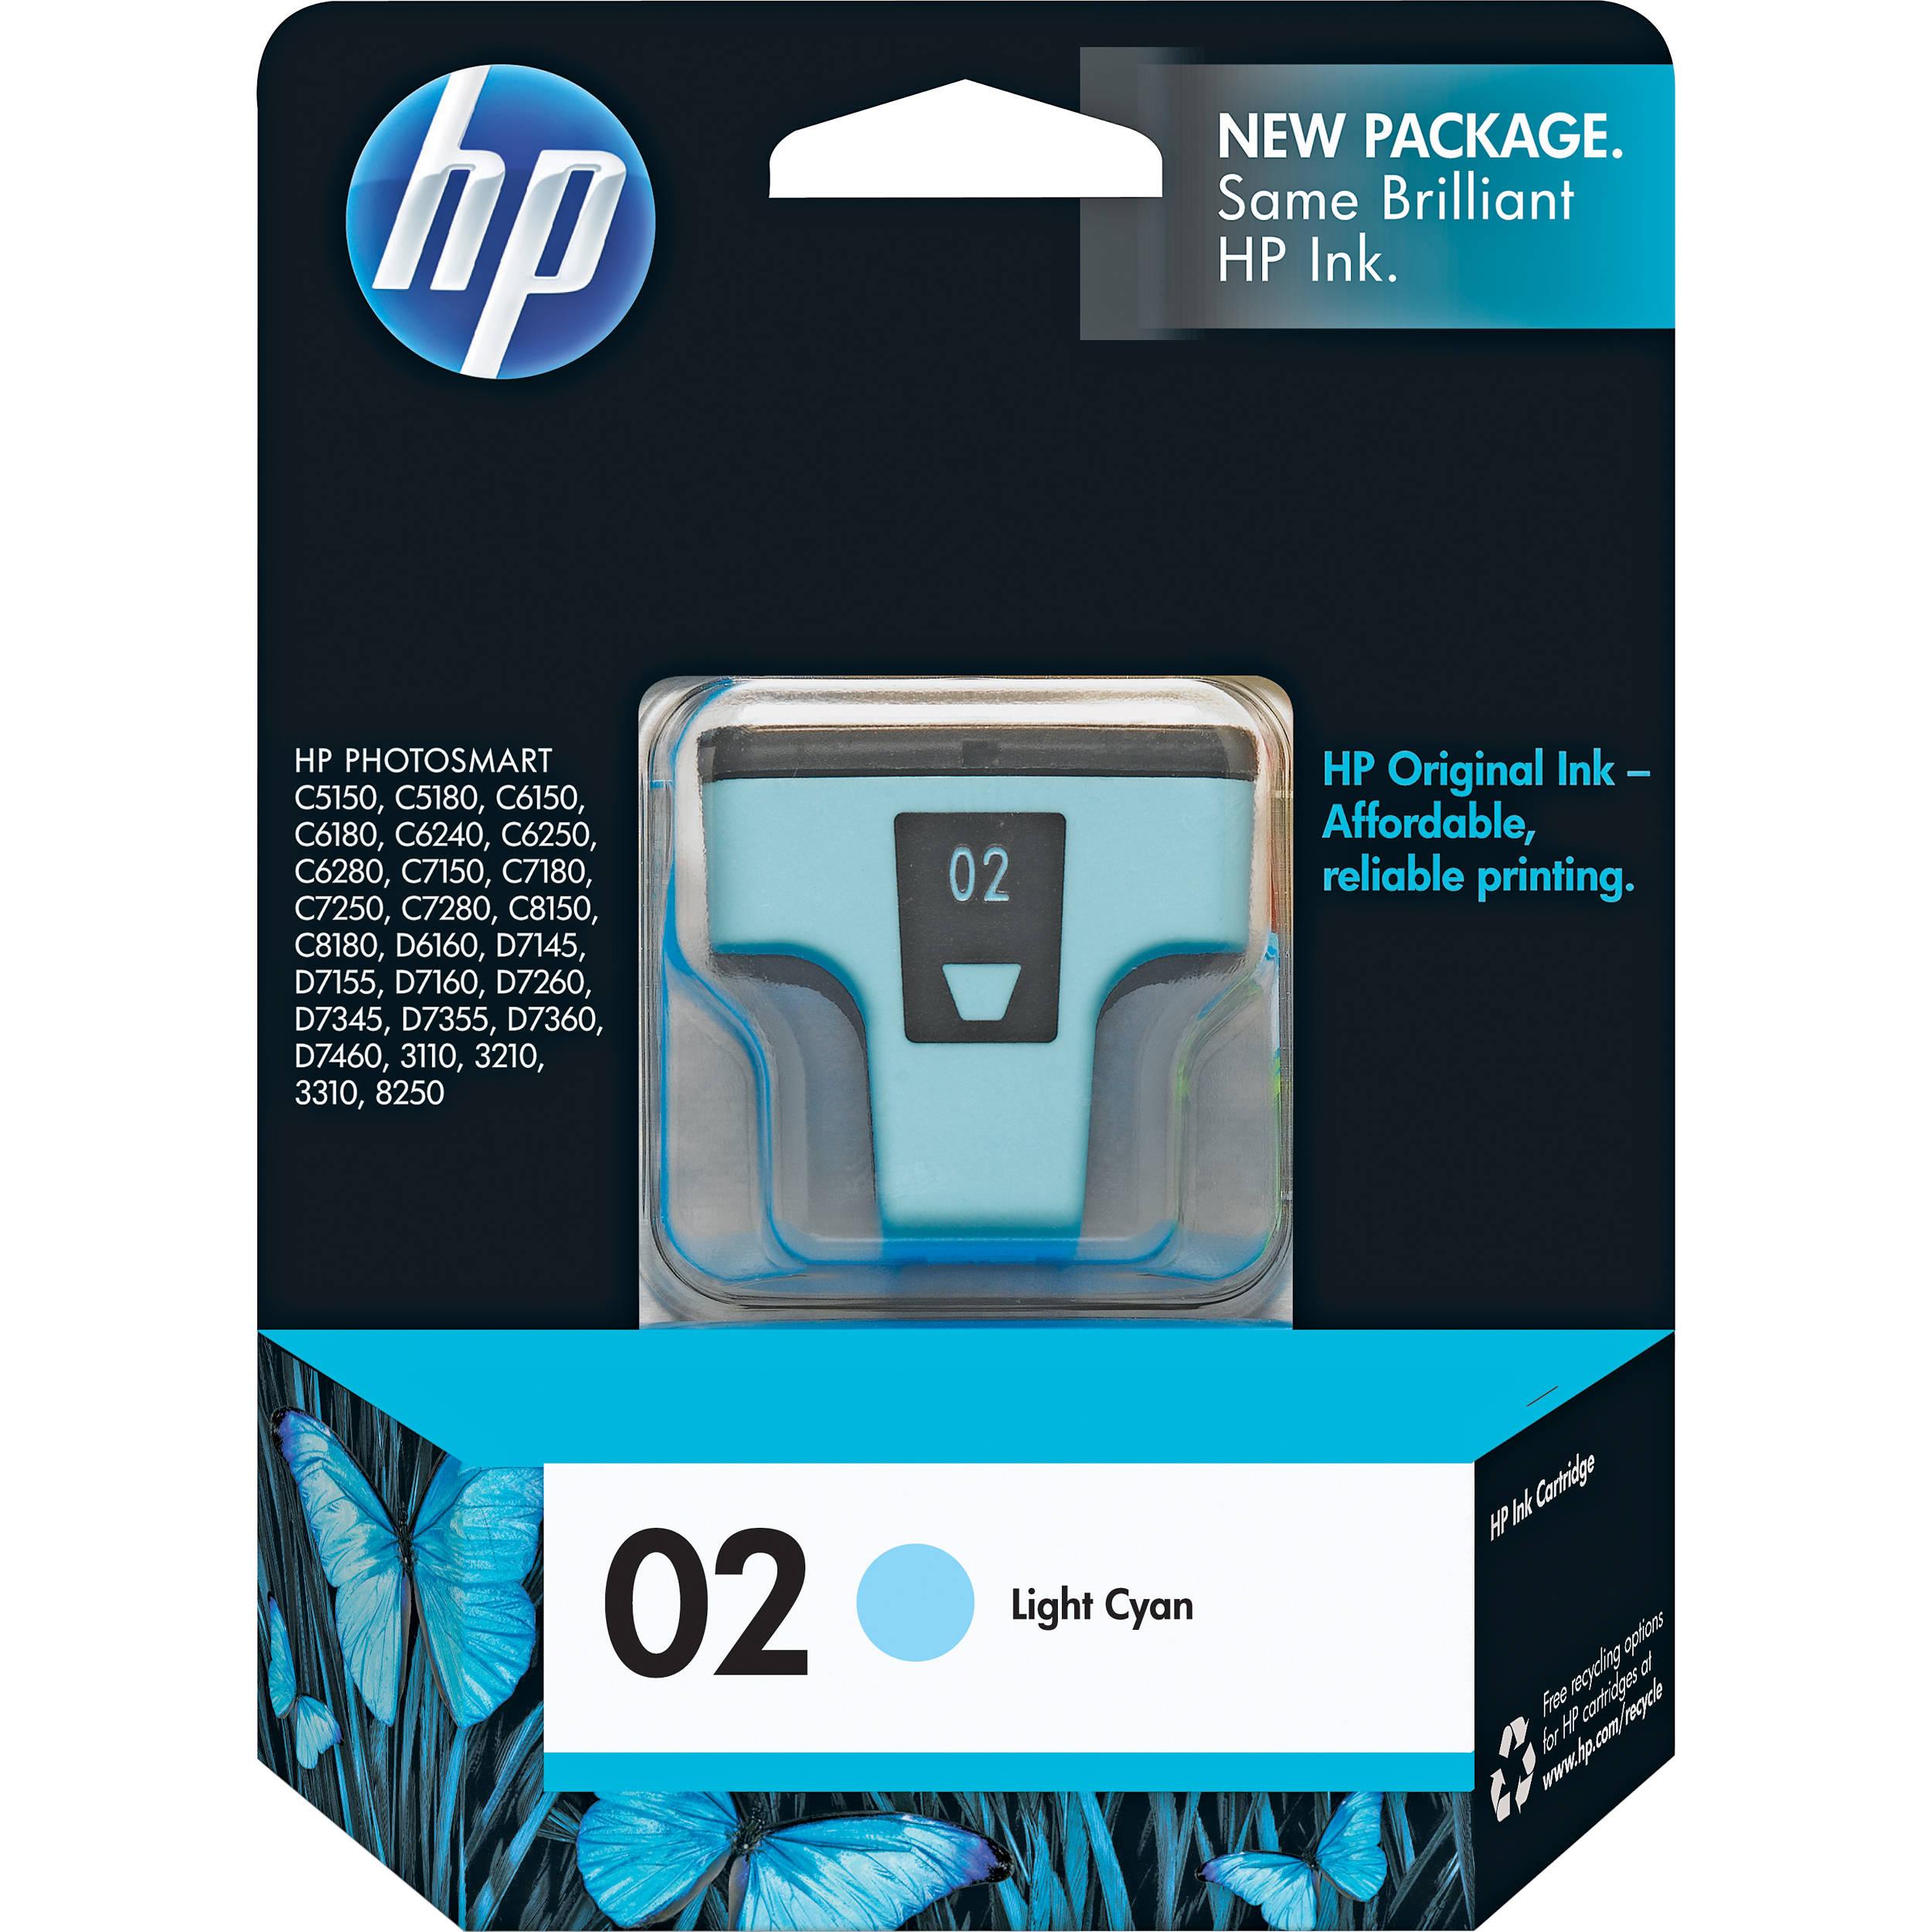 Hp 02 Light Cyan Inkjet Print Cartridge 5 5ml C8774wn B Amp H